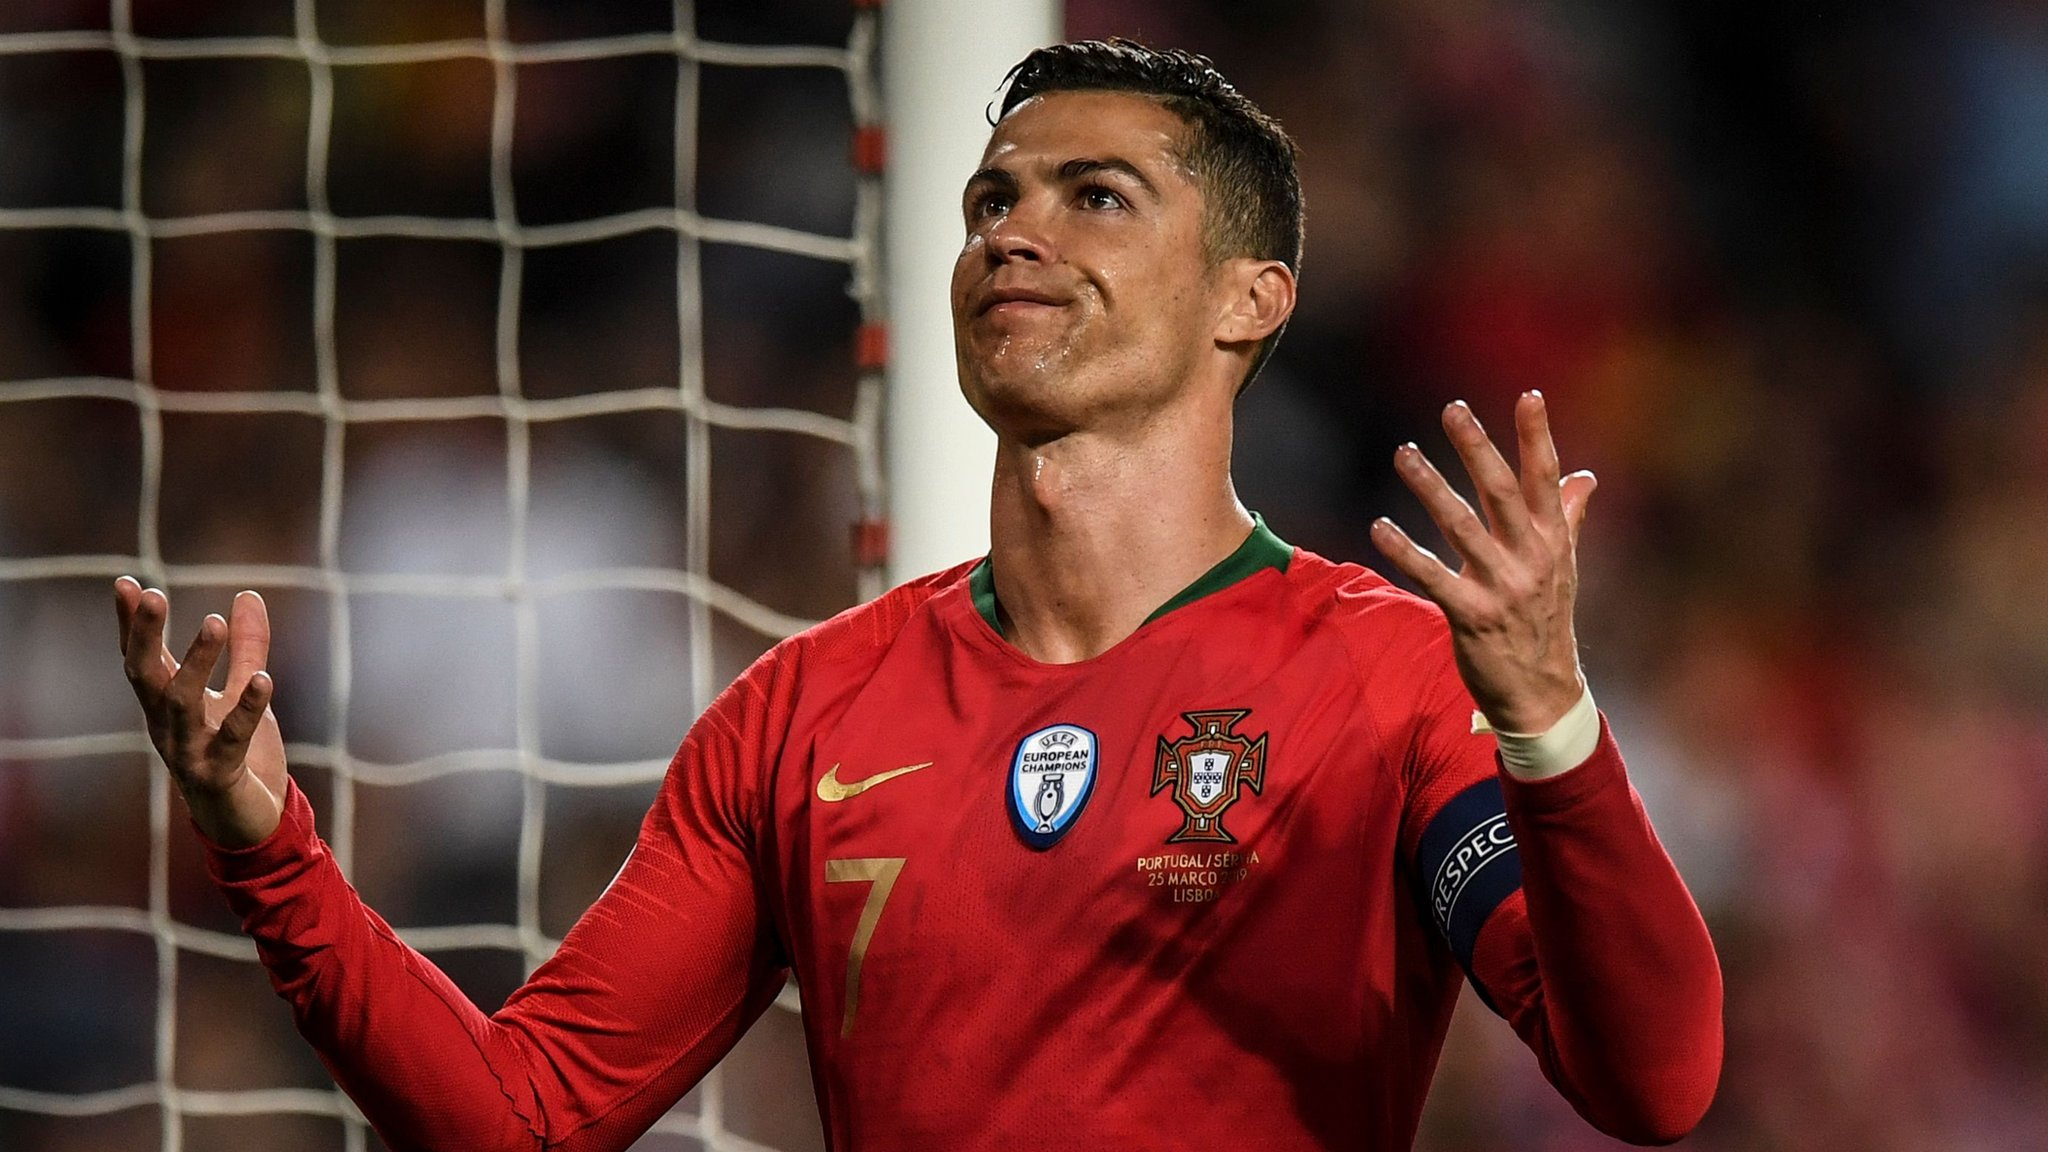 Portugal 1-1 Serbia: Cristiano Ronaldo suffers hamstring injury